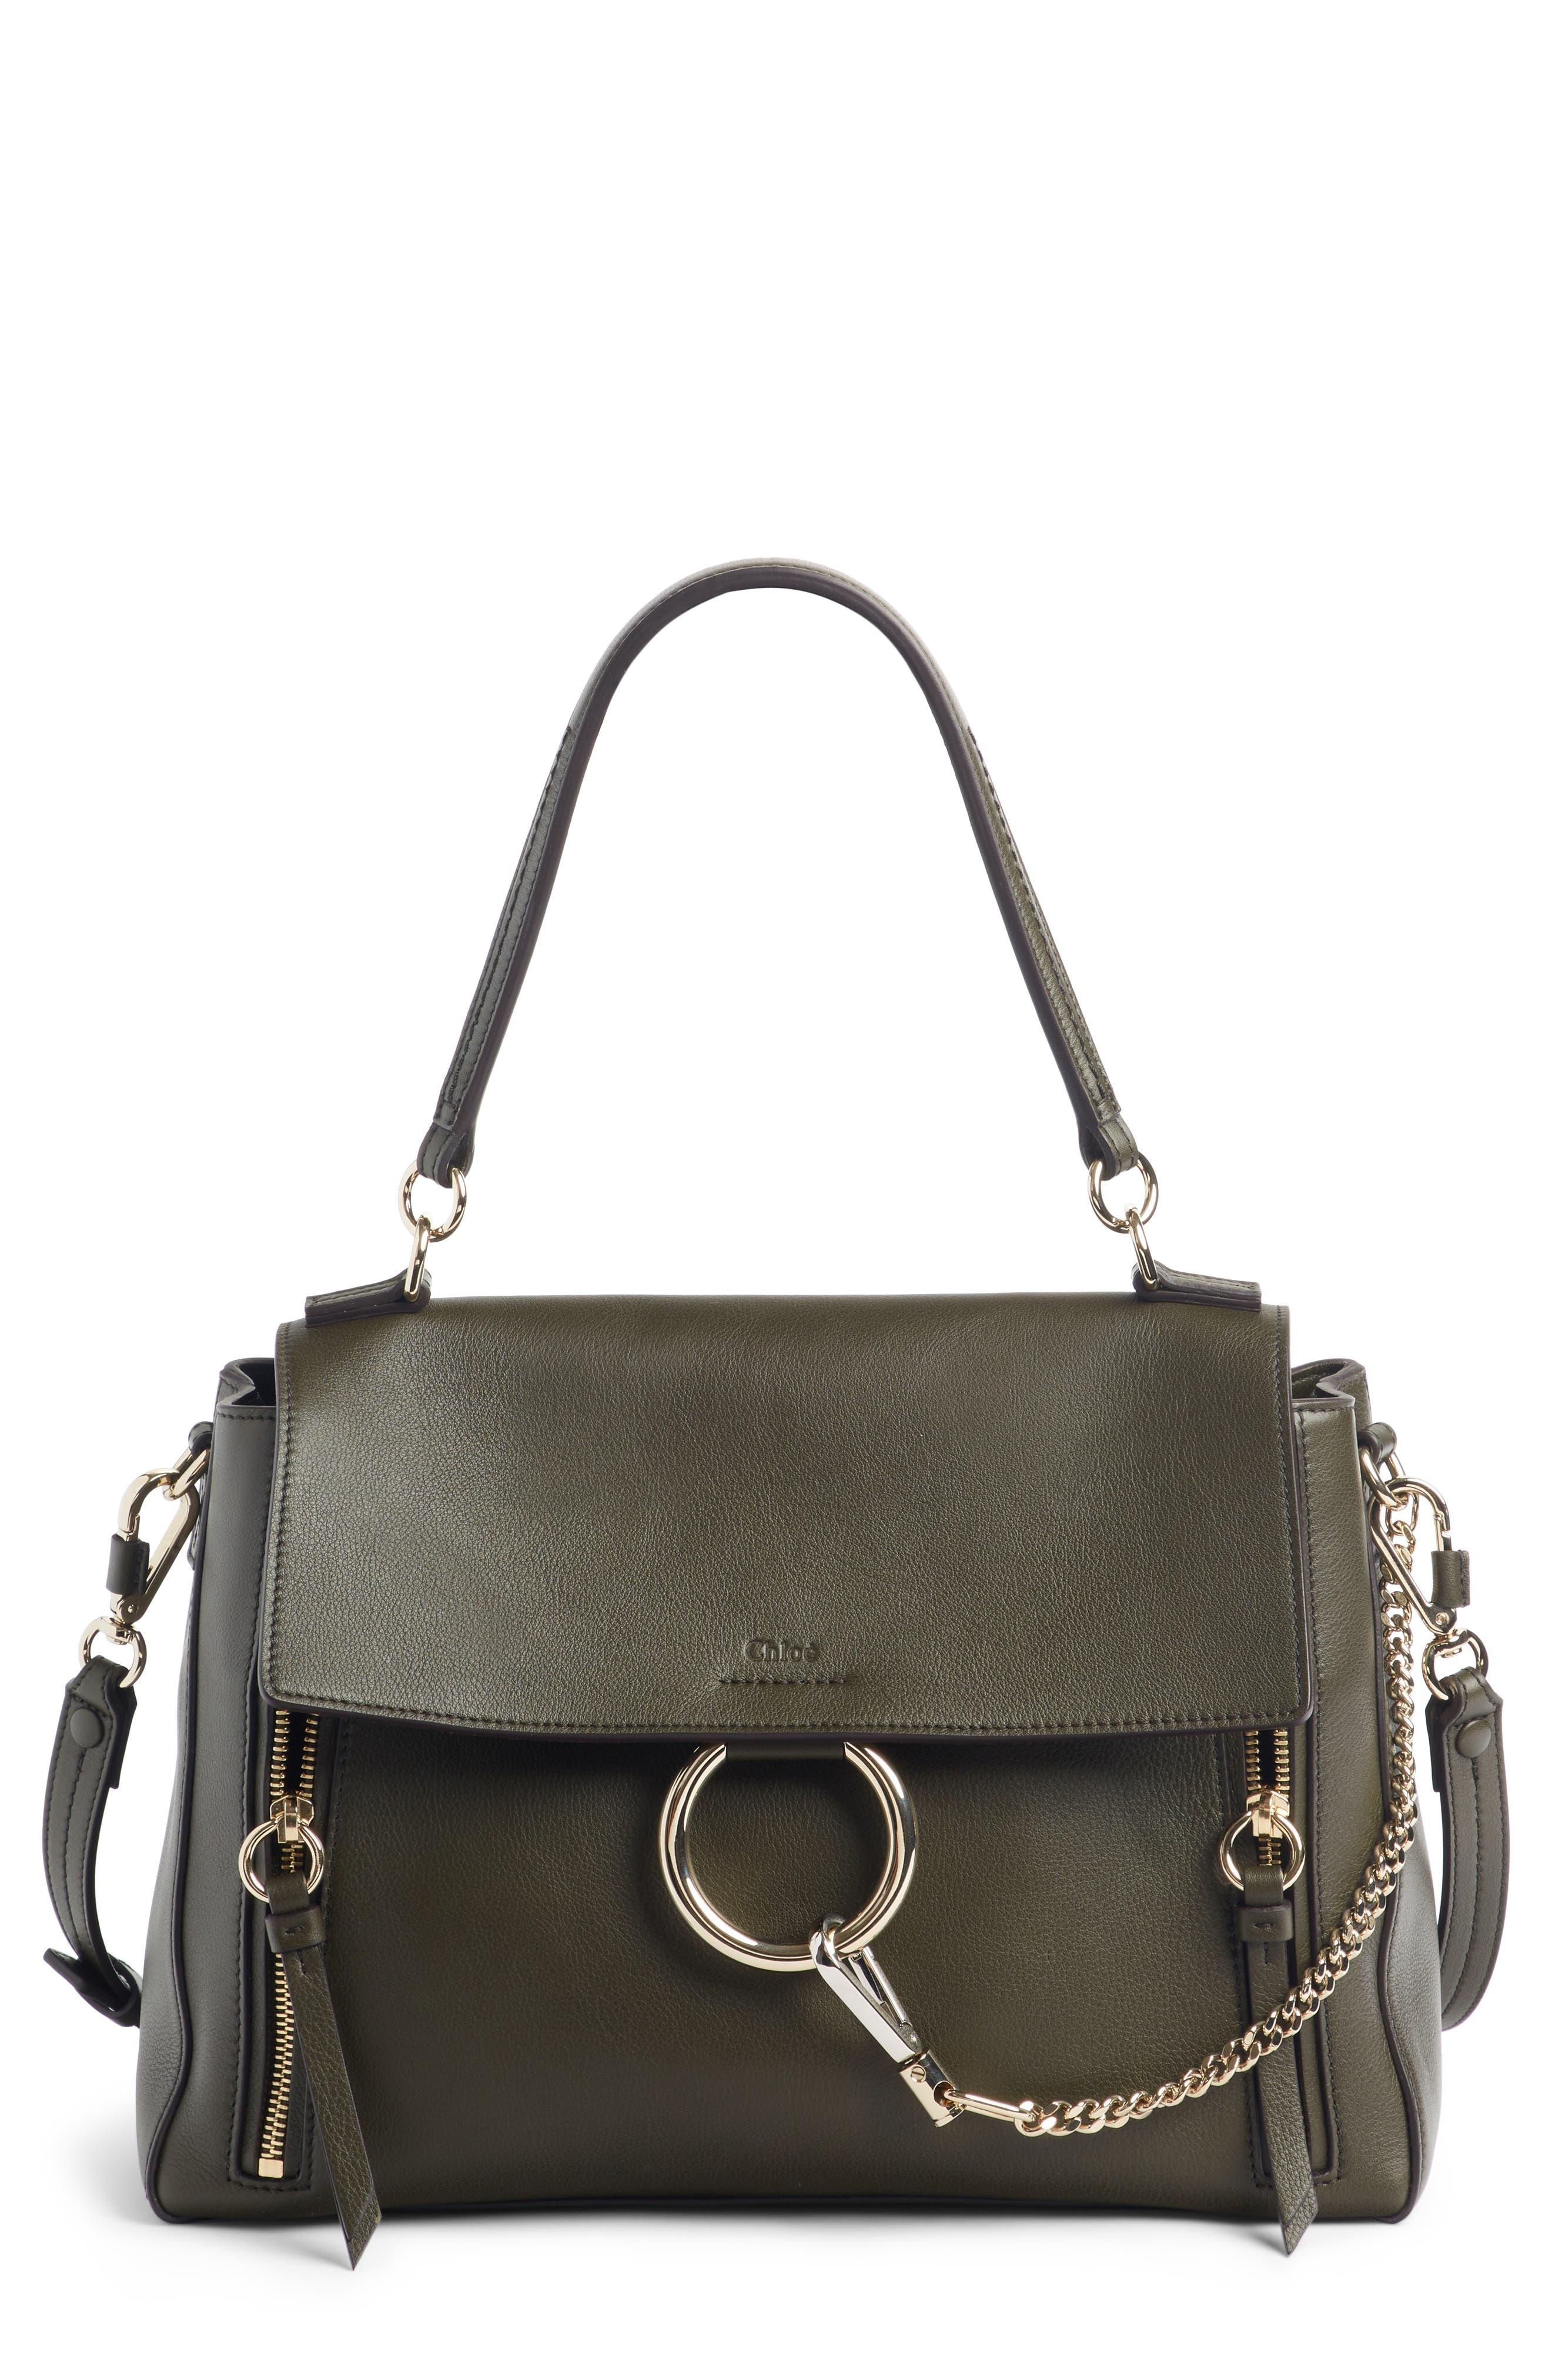 Medium Faye Leather Shoulder Bag,                             Main thumbnail 1, color,                             DEEP FOREST